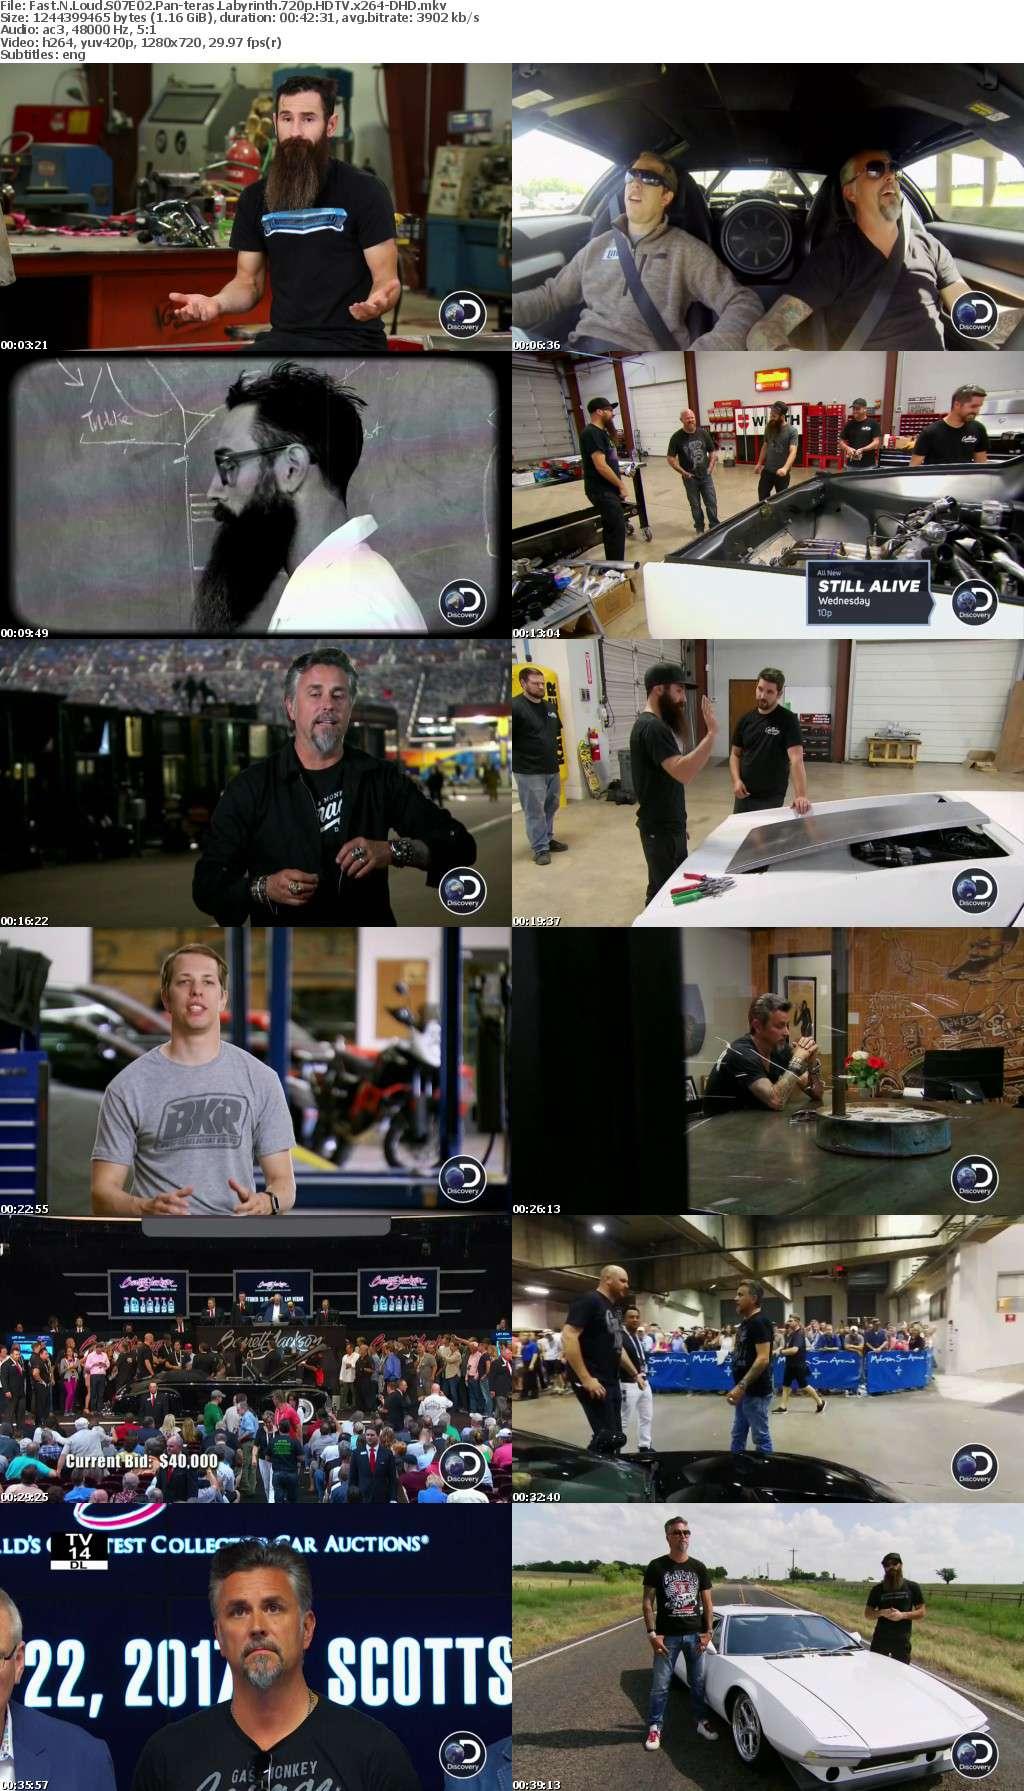 Fast N Loud S07E02 Pan-teras Labyrinth 720p HDTV x264-DHD